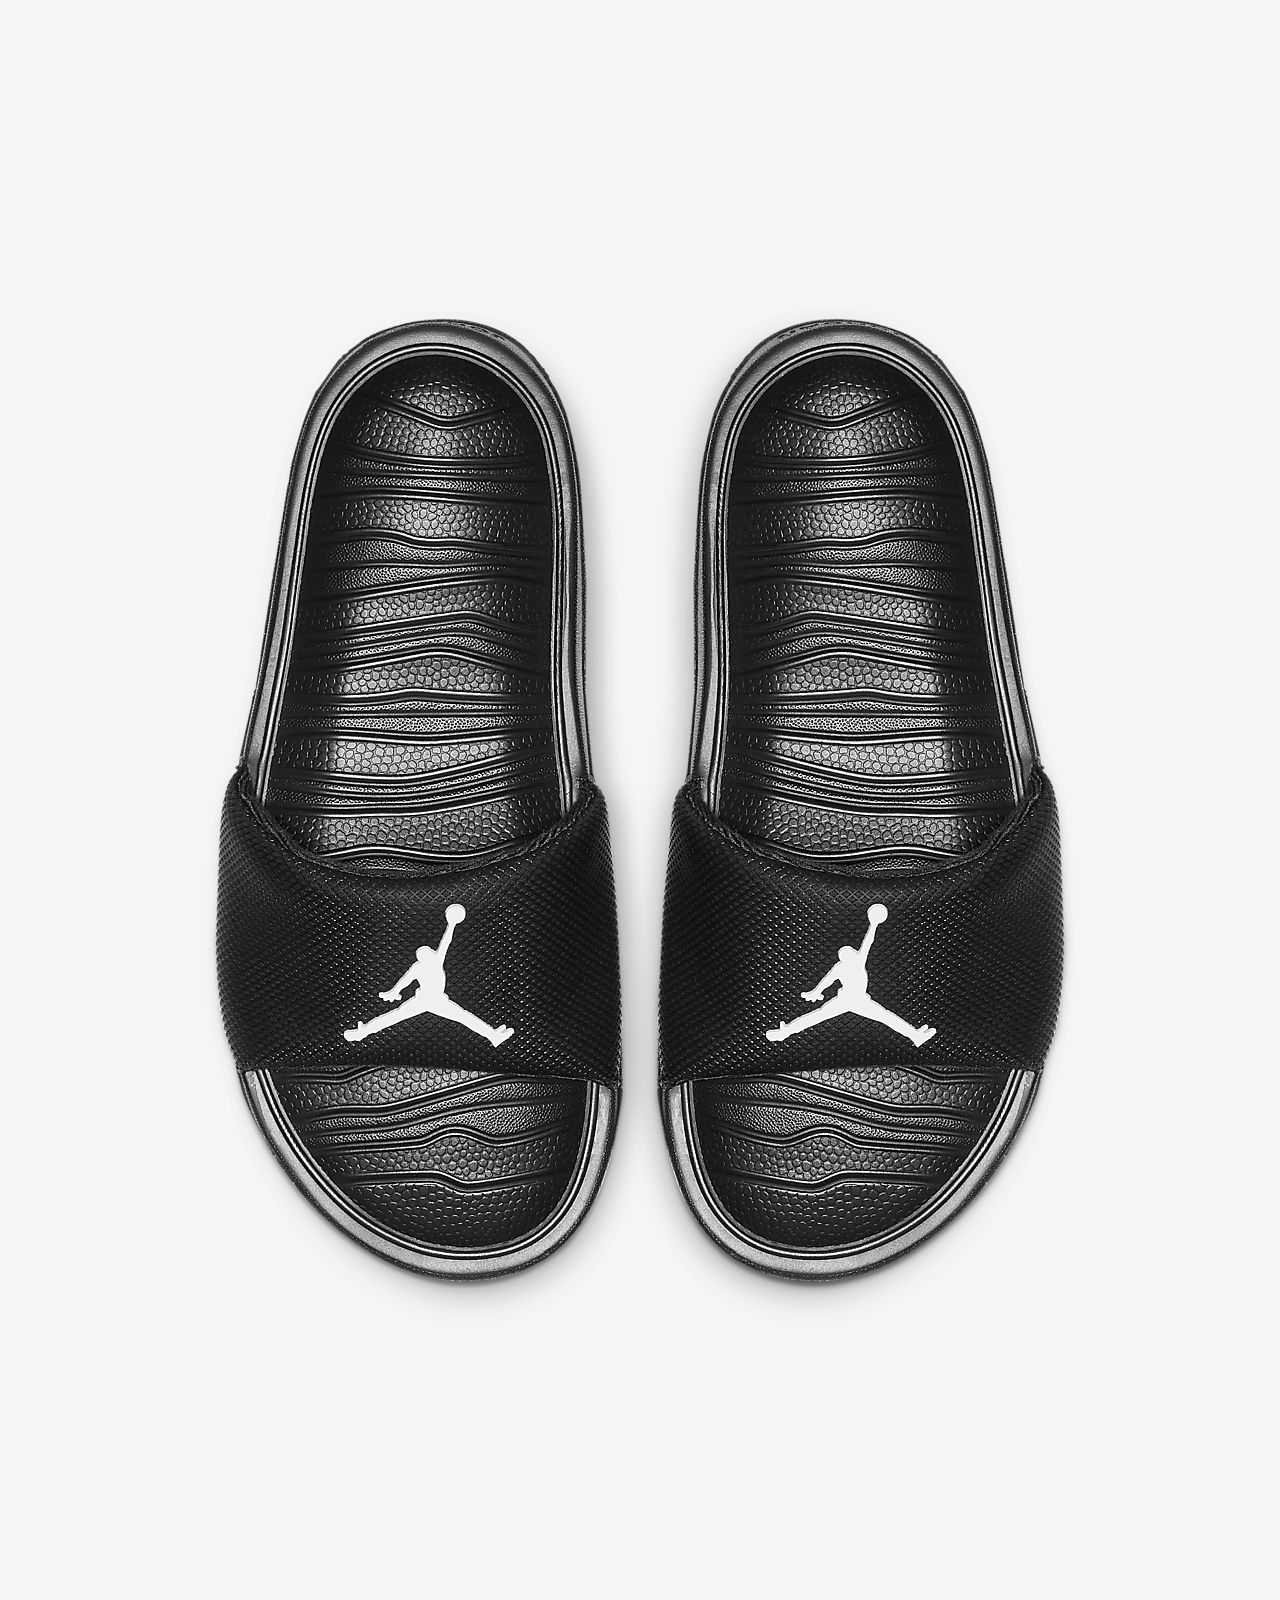 Jordan Break Big Kids' Slide